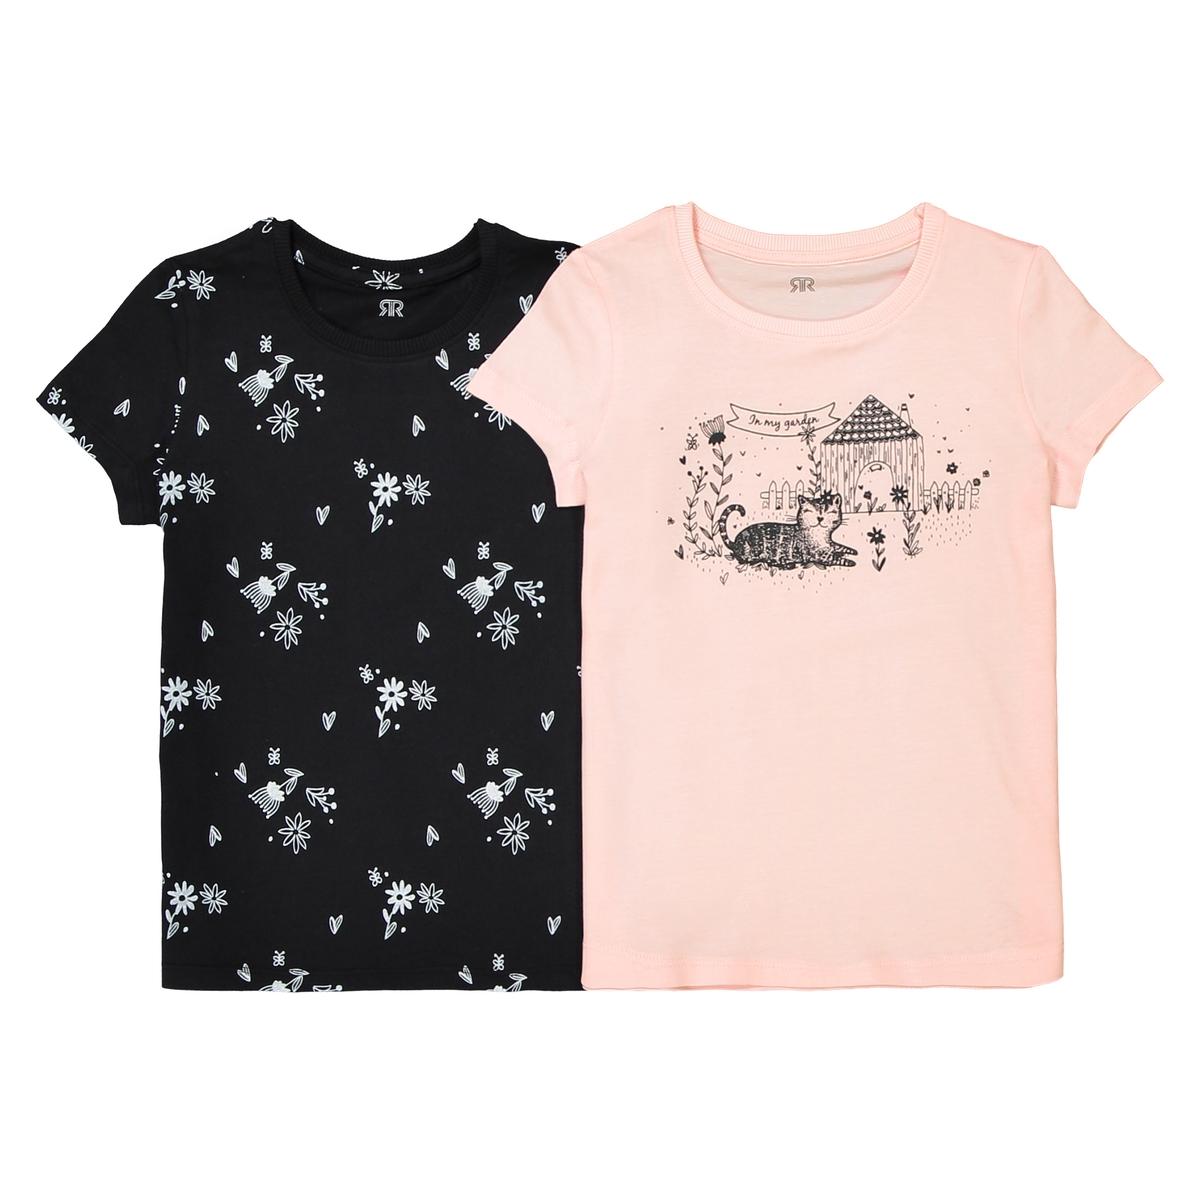 2 футболки с рисунком, 3-12 лет